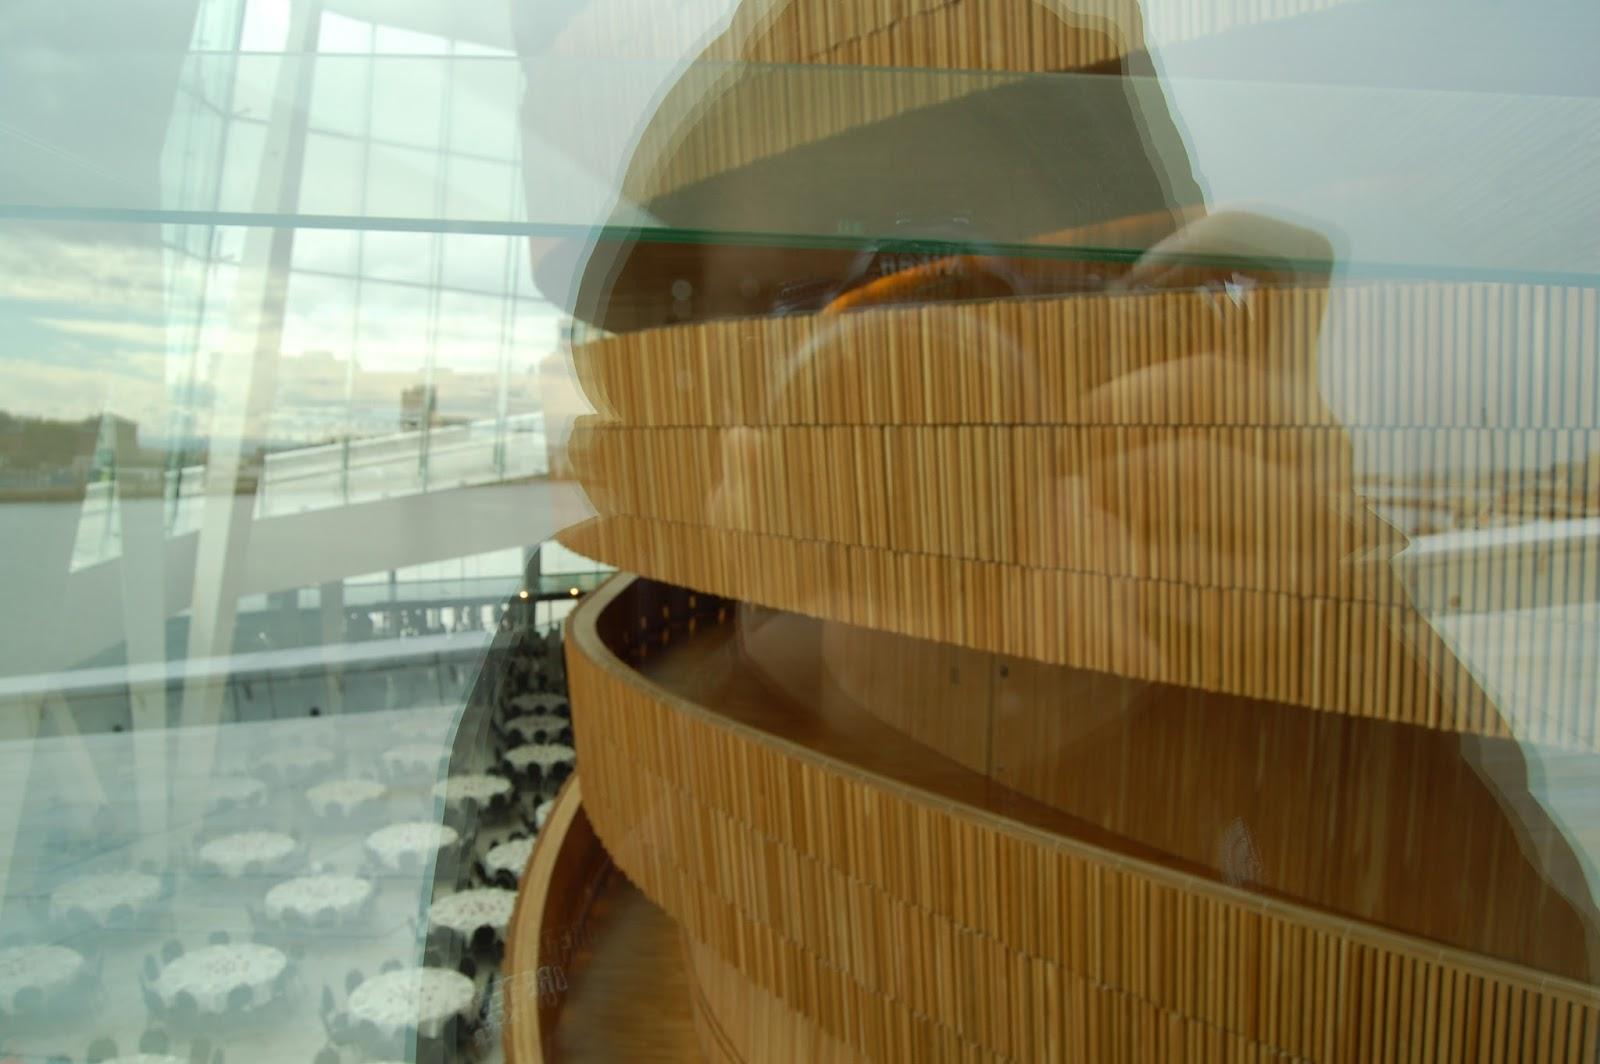 architektura norweska, opera, Oslo, Norwegia